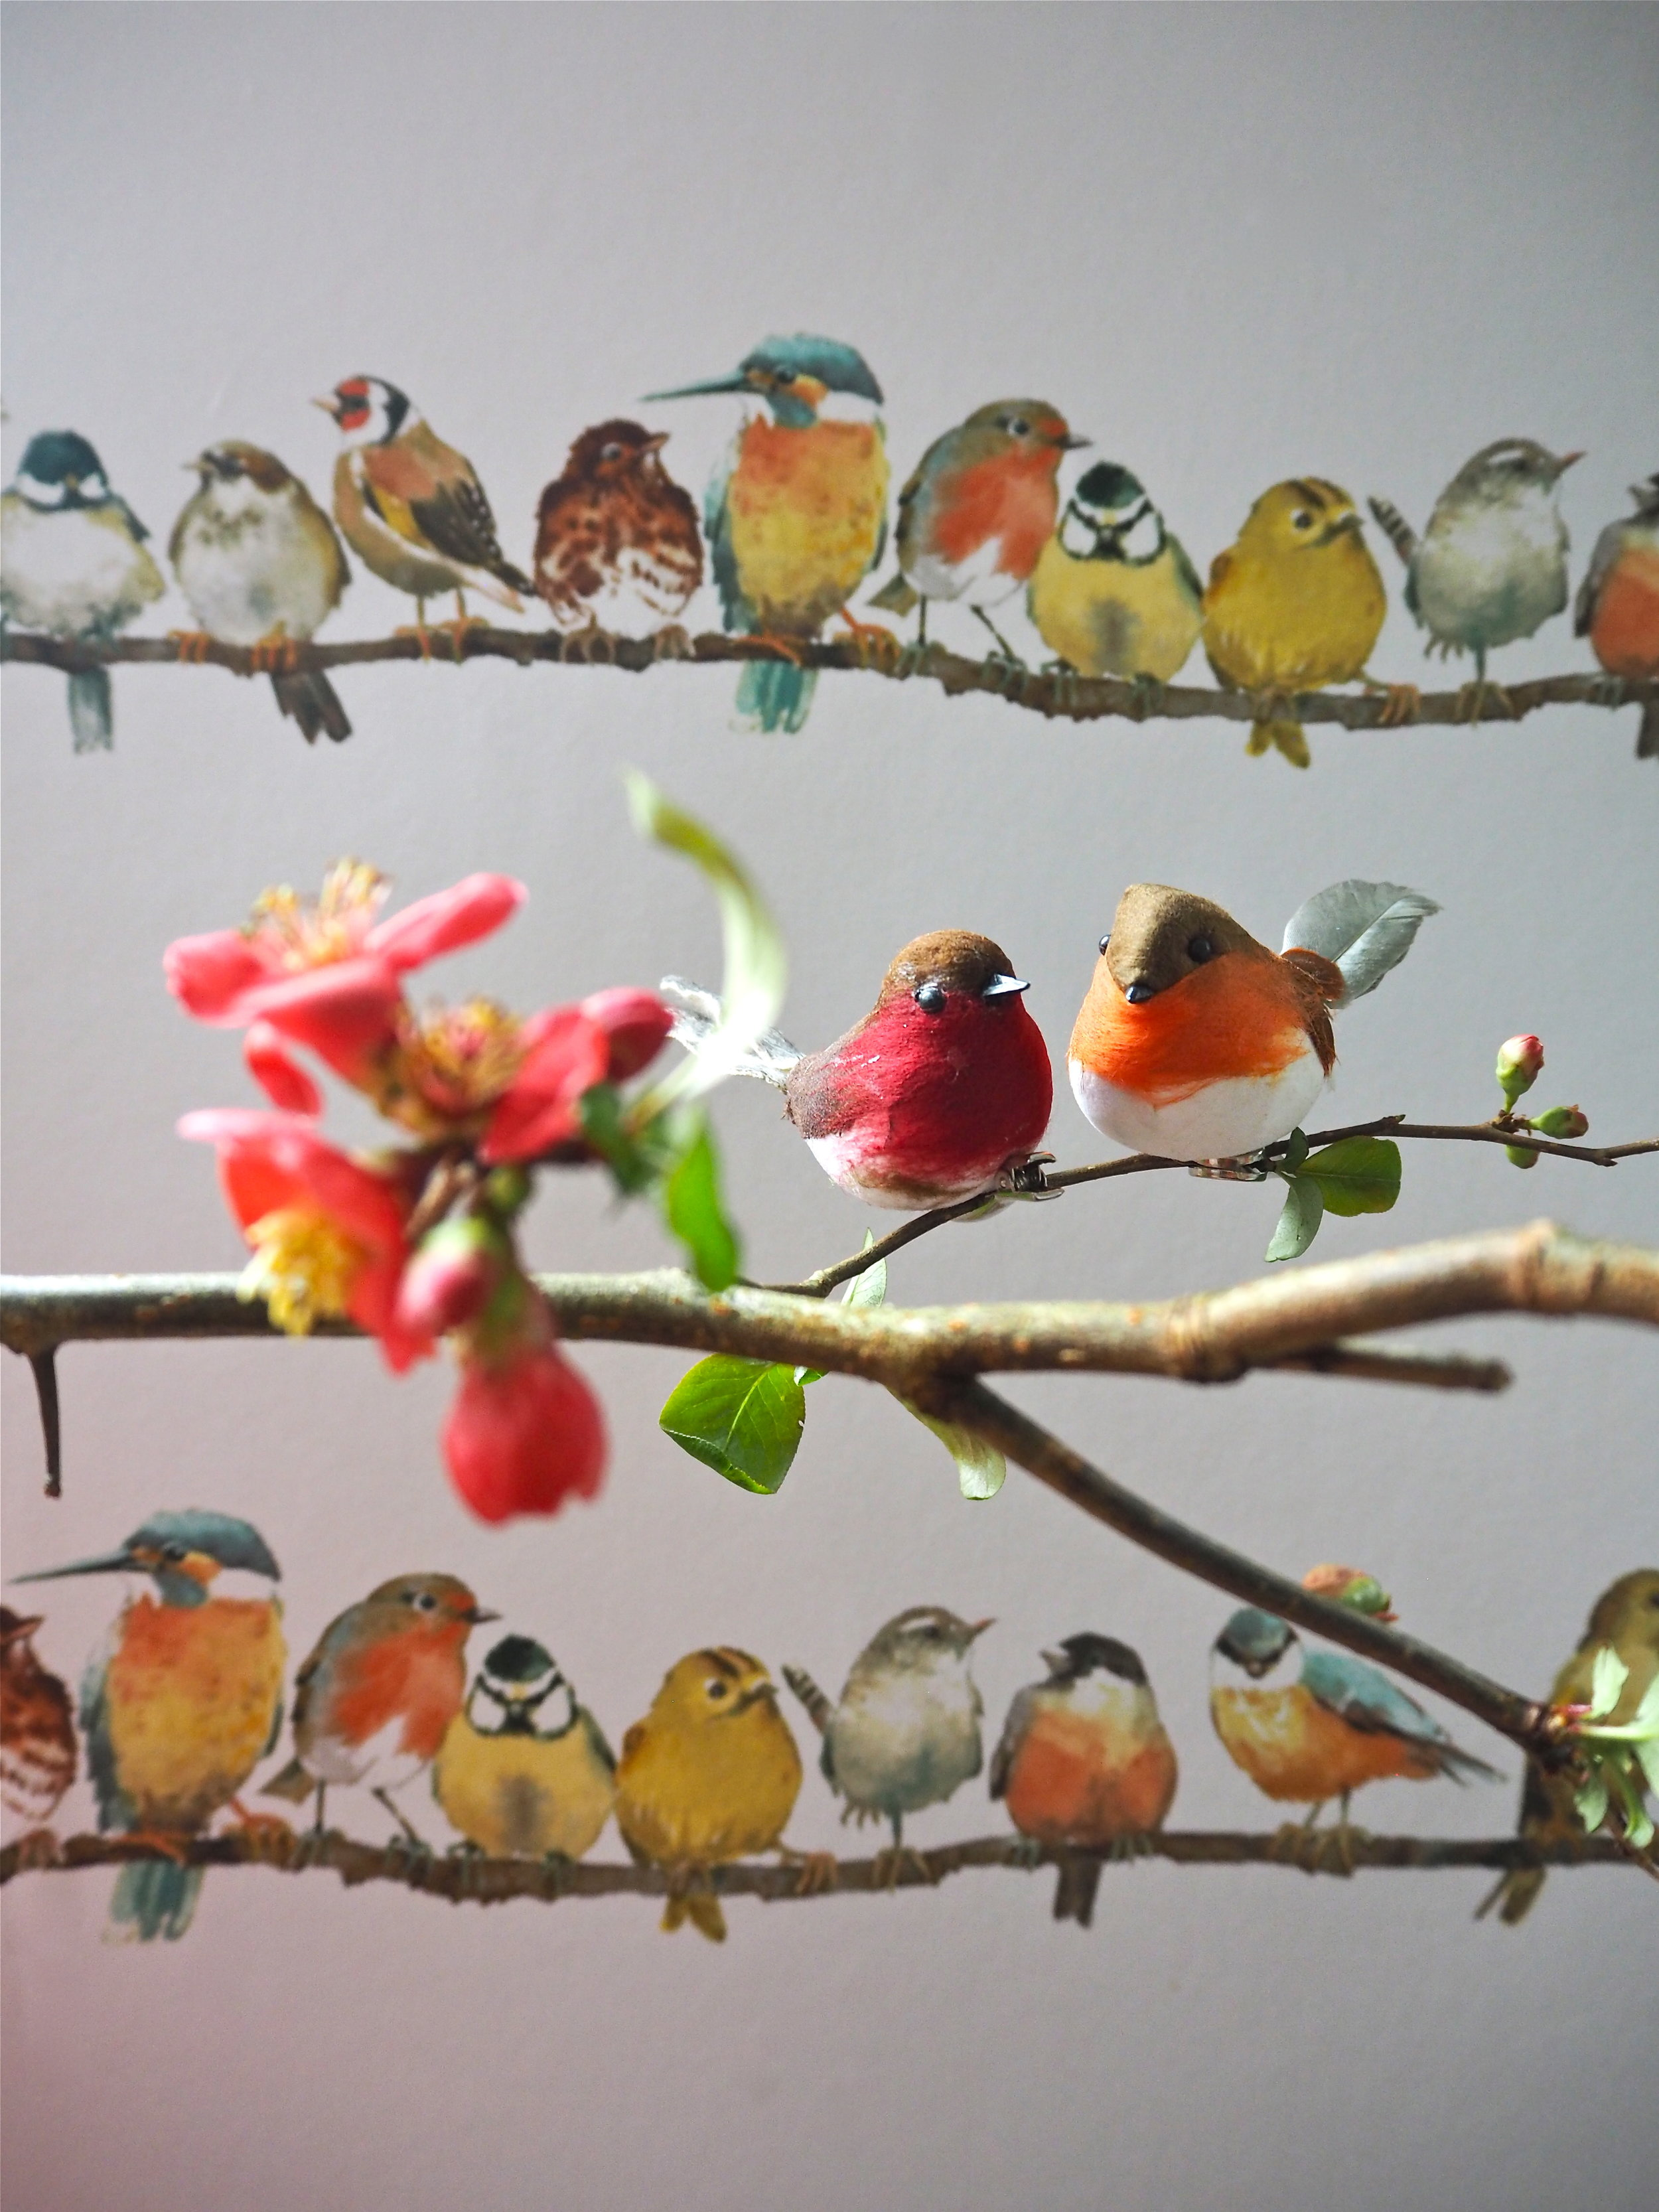 laurah ashley garden birds wallpaper.jpg